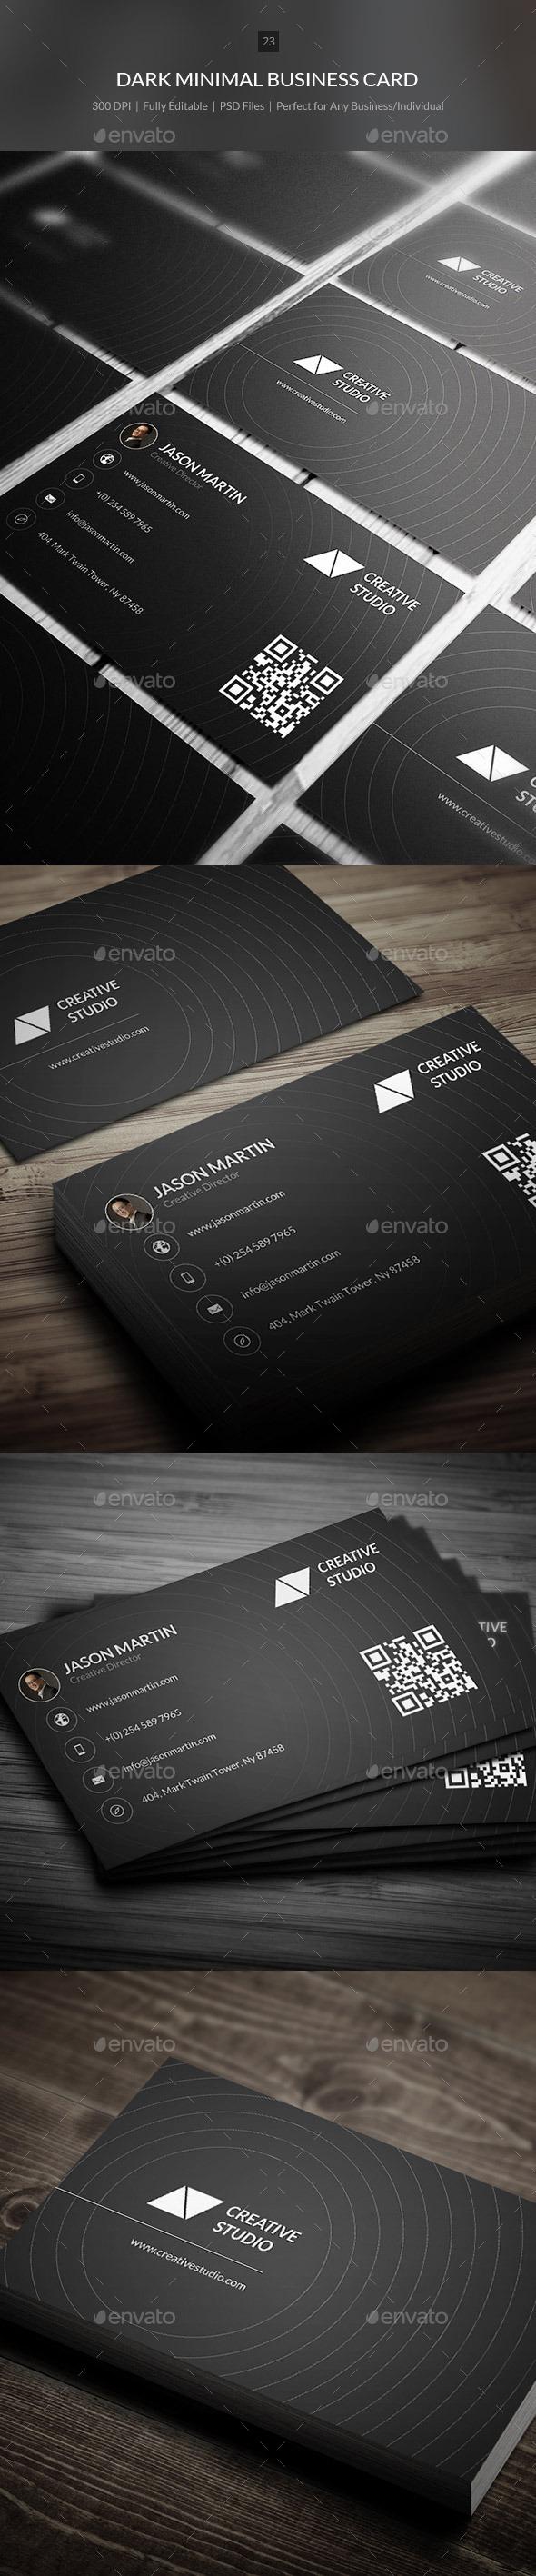 GraphicRiver Dark Minimal Business Card 23 9618110